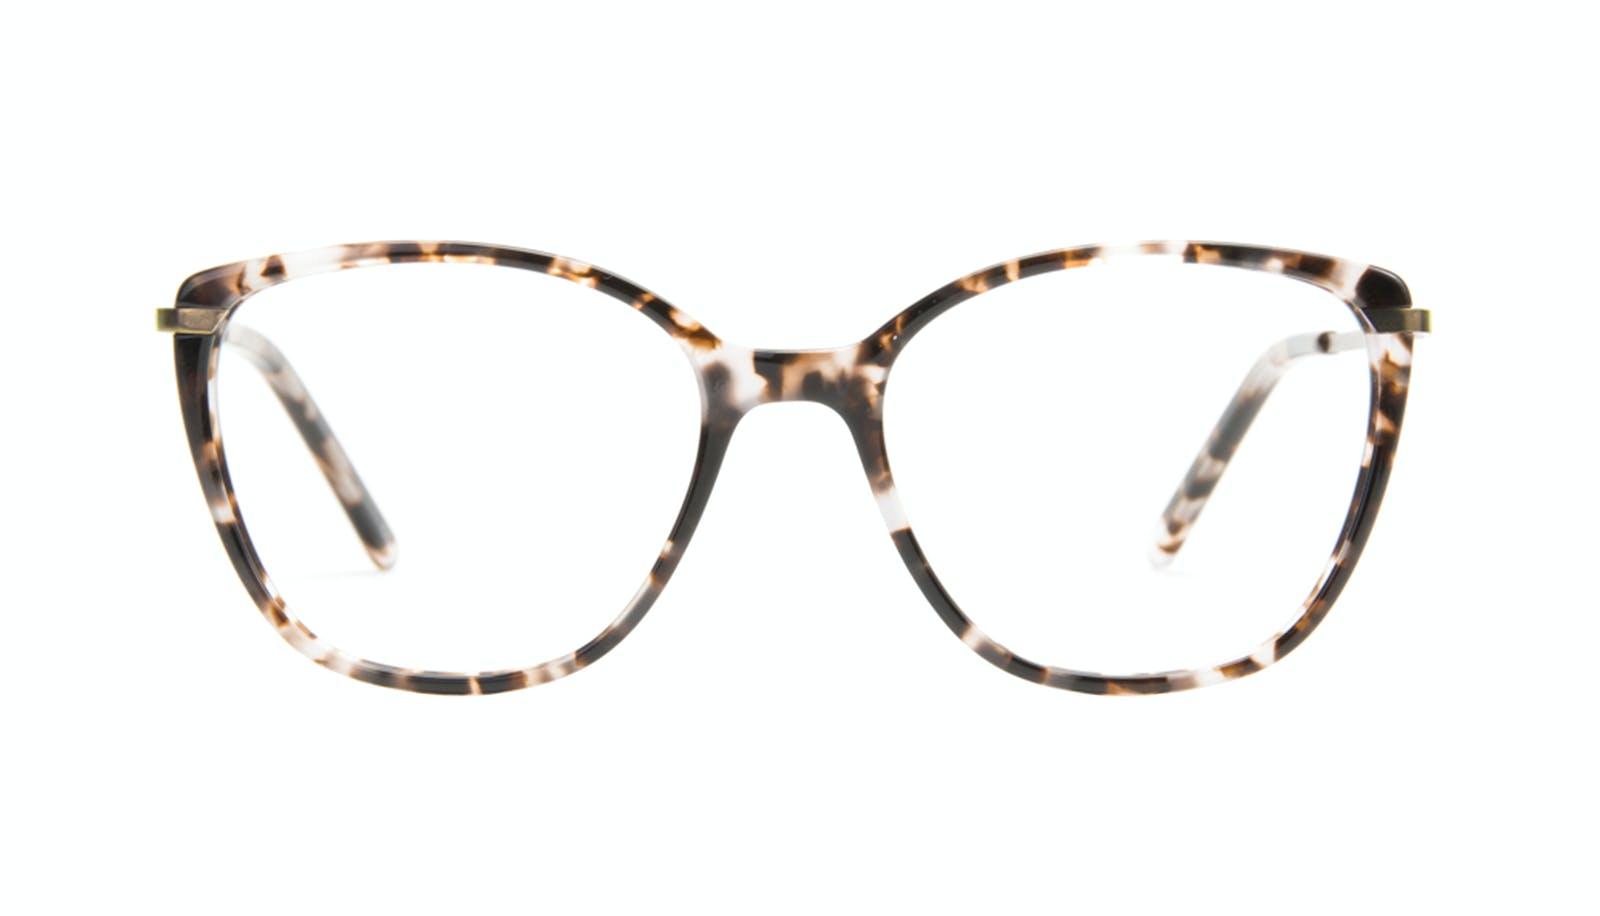 14b89a923b4 Affordable Fashion Glasses Cat Eye Rectangle Square Eyeglasses Women  Illusion Sand